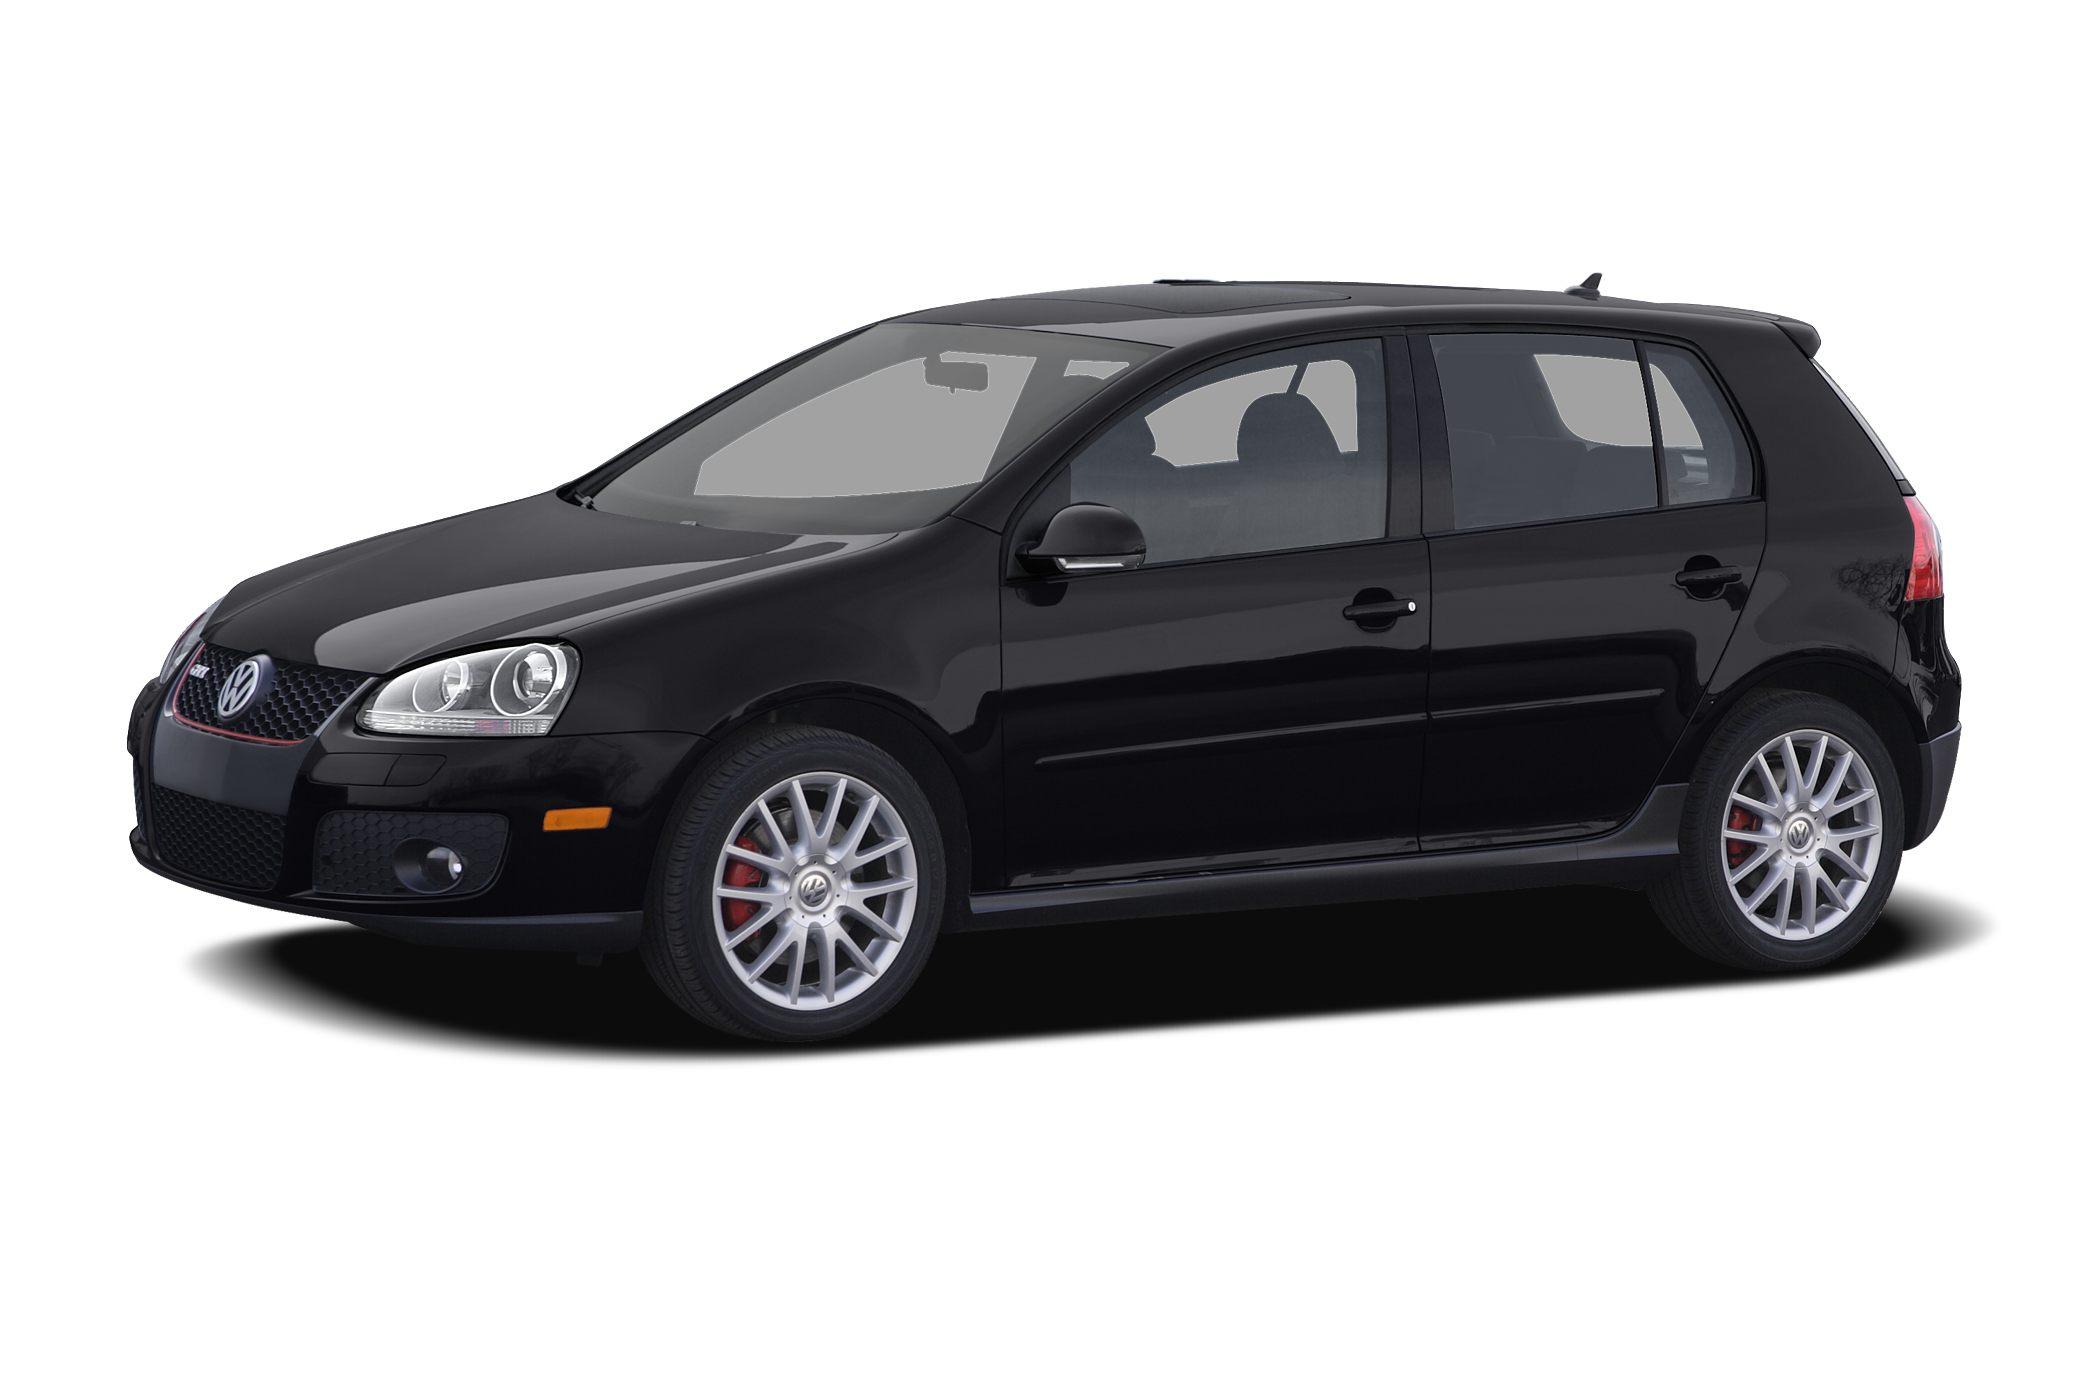 2009 Volkswagen GTI 4-Door Vehicle Options ABS Brakes Front Heated Seat Rear Window Defogger Air C